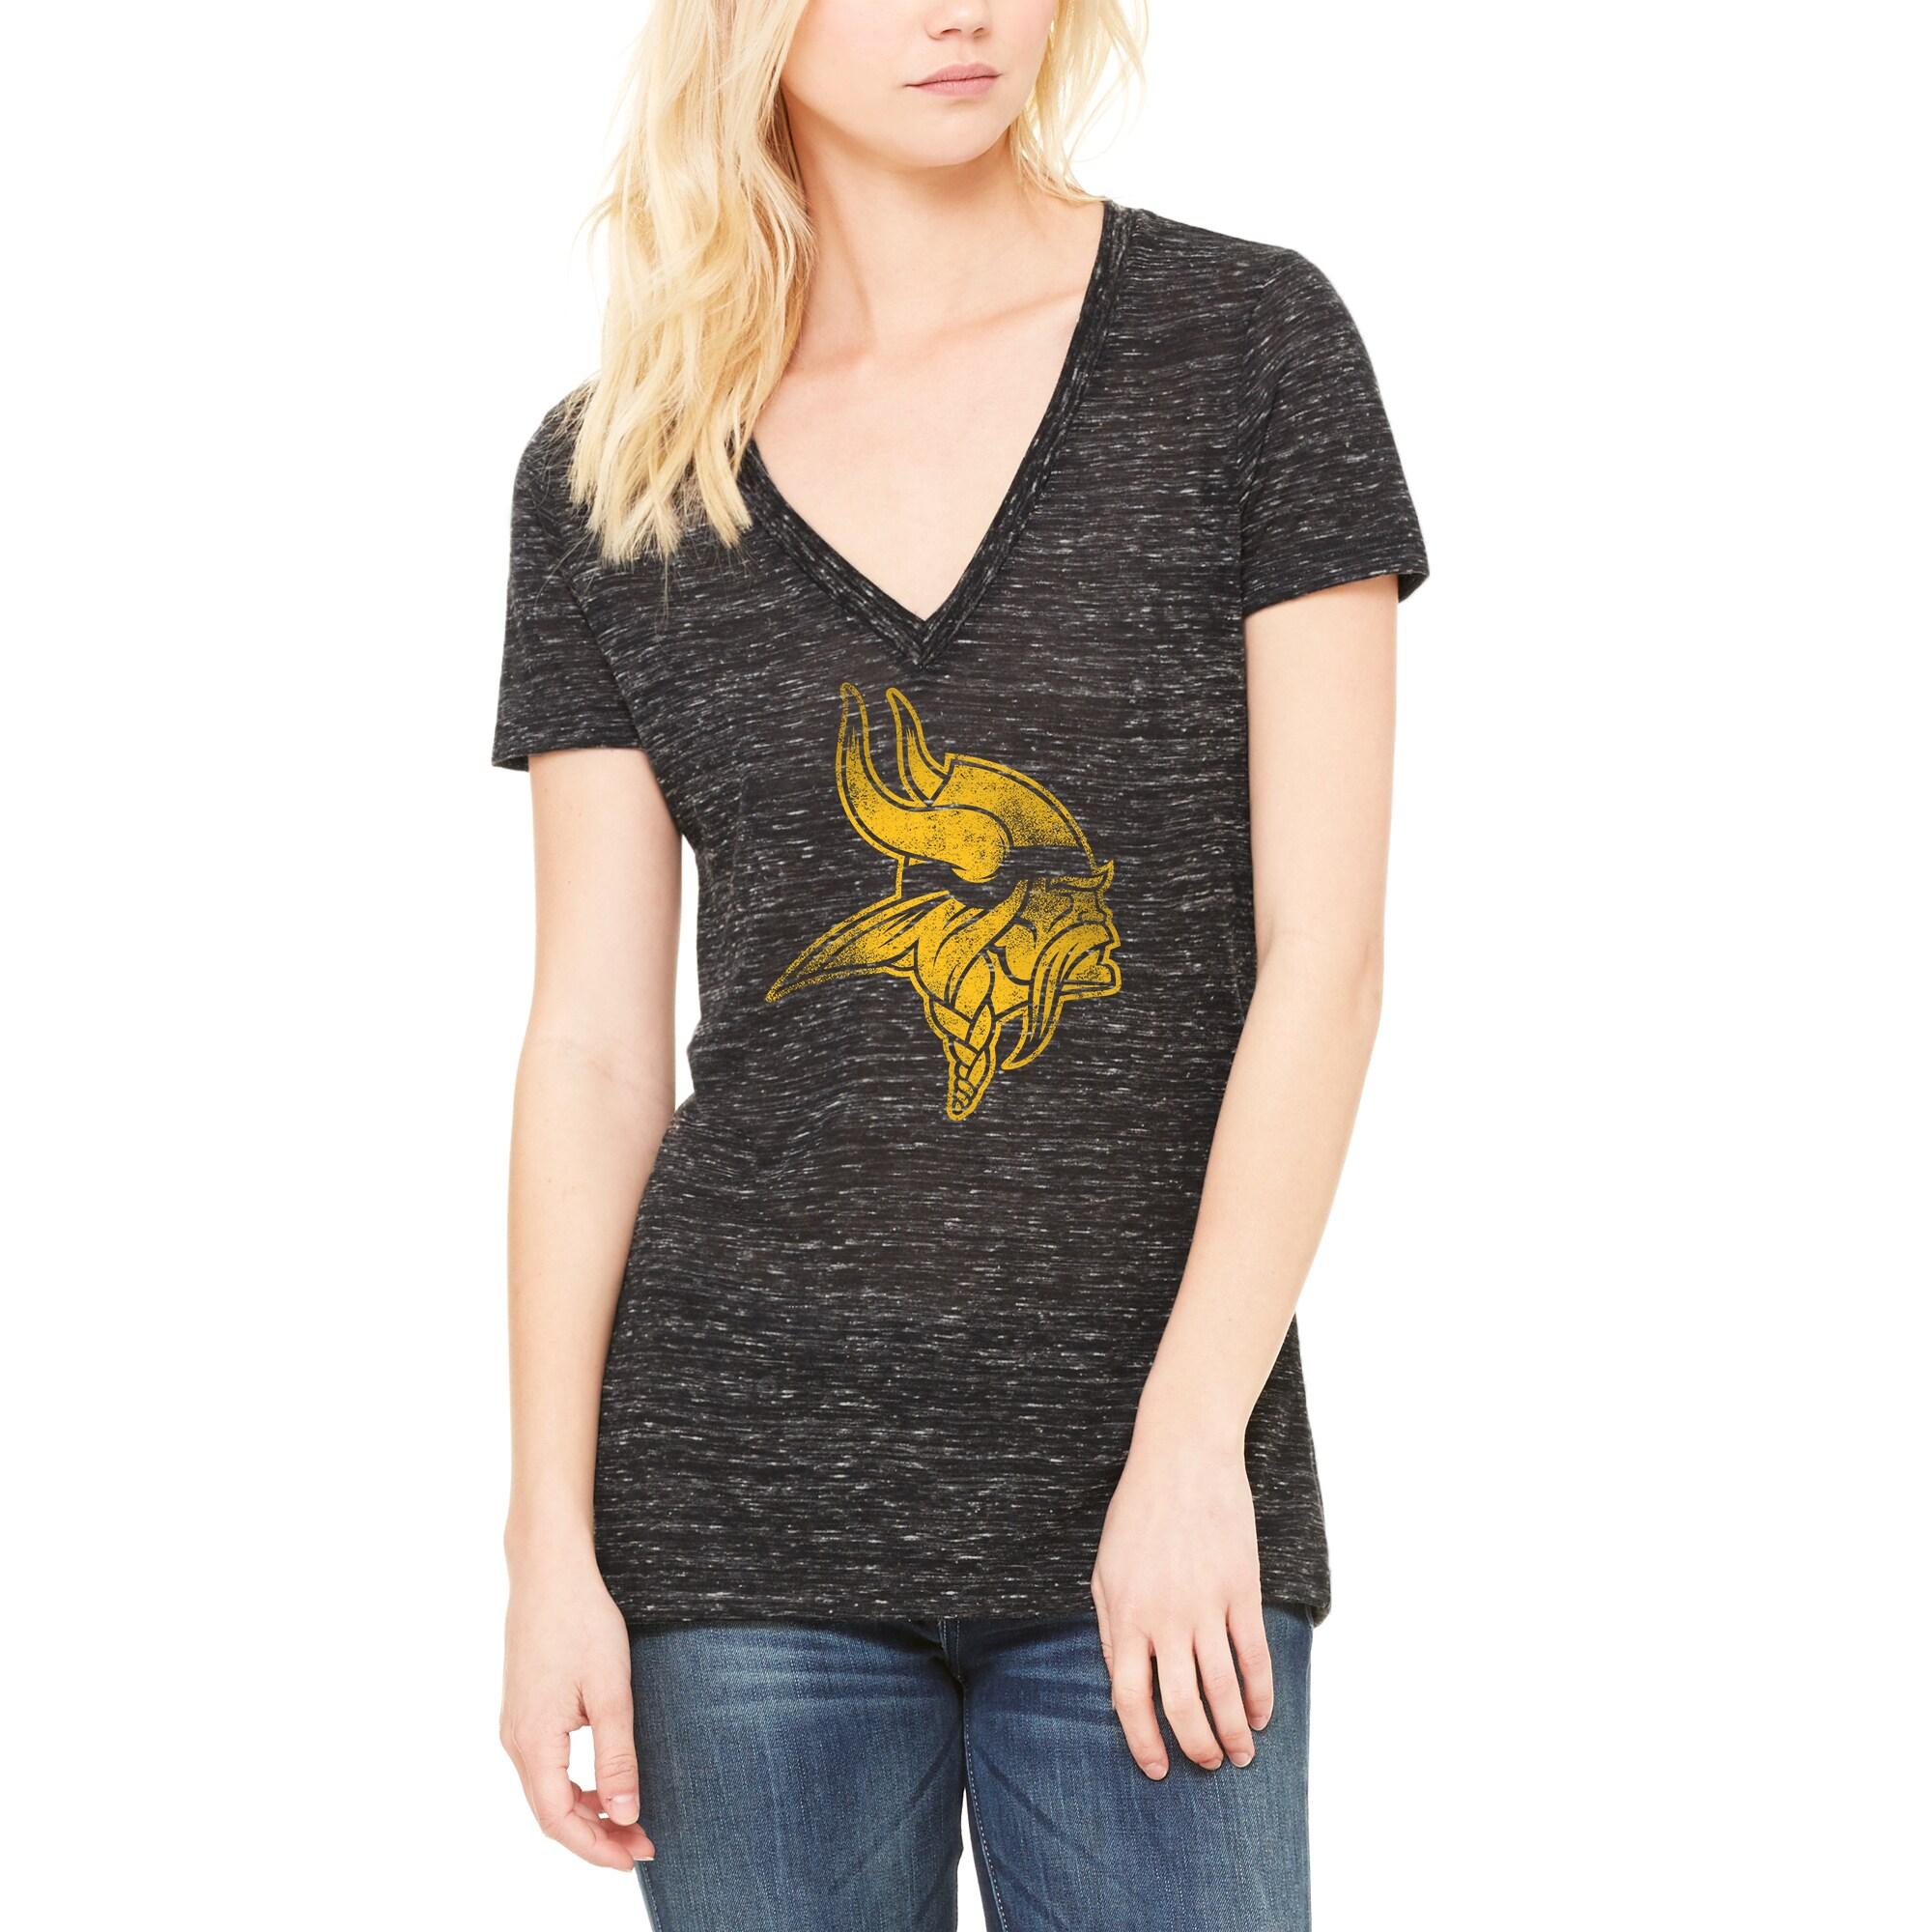 Minnesota Vikings Let Loose by RNL Women's Distressed Primary Logo T-Shirt - Black Marble